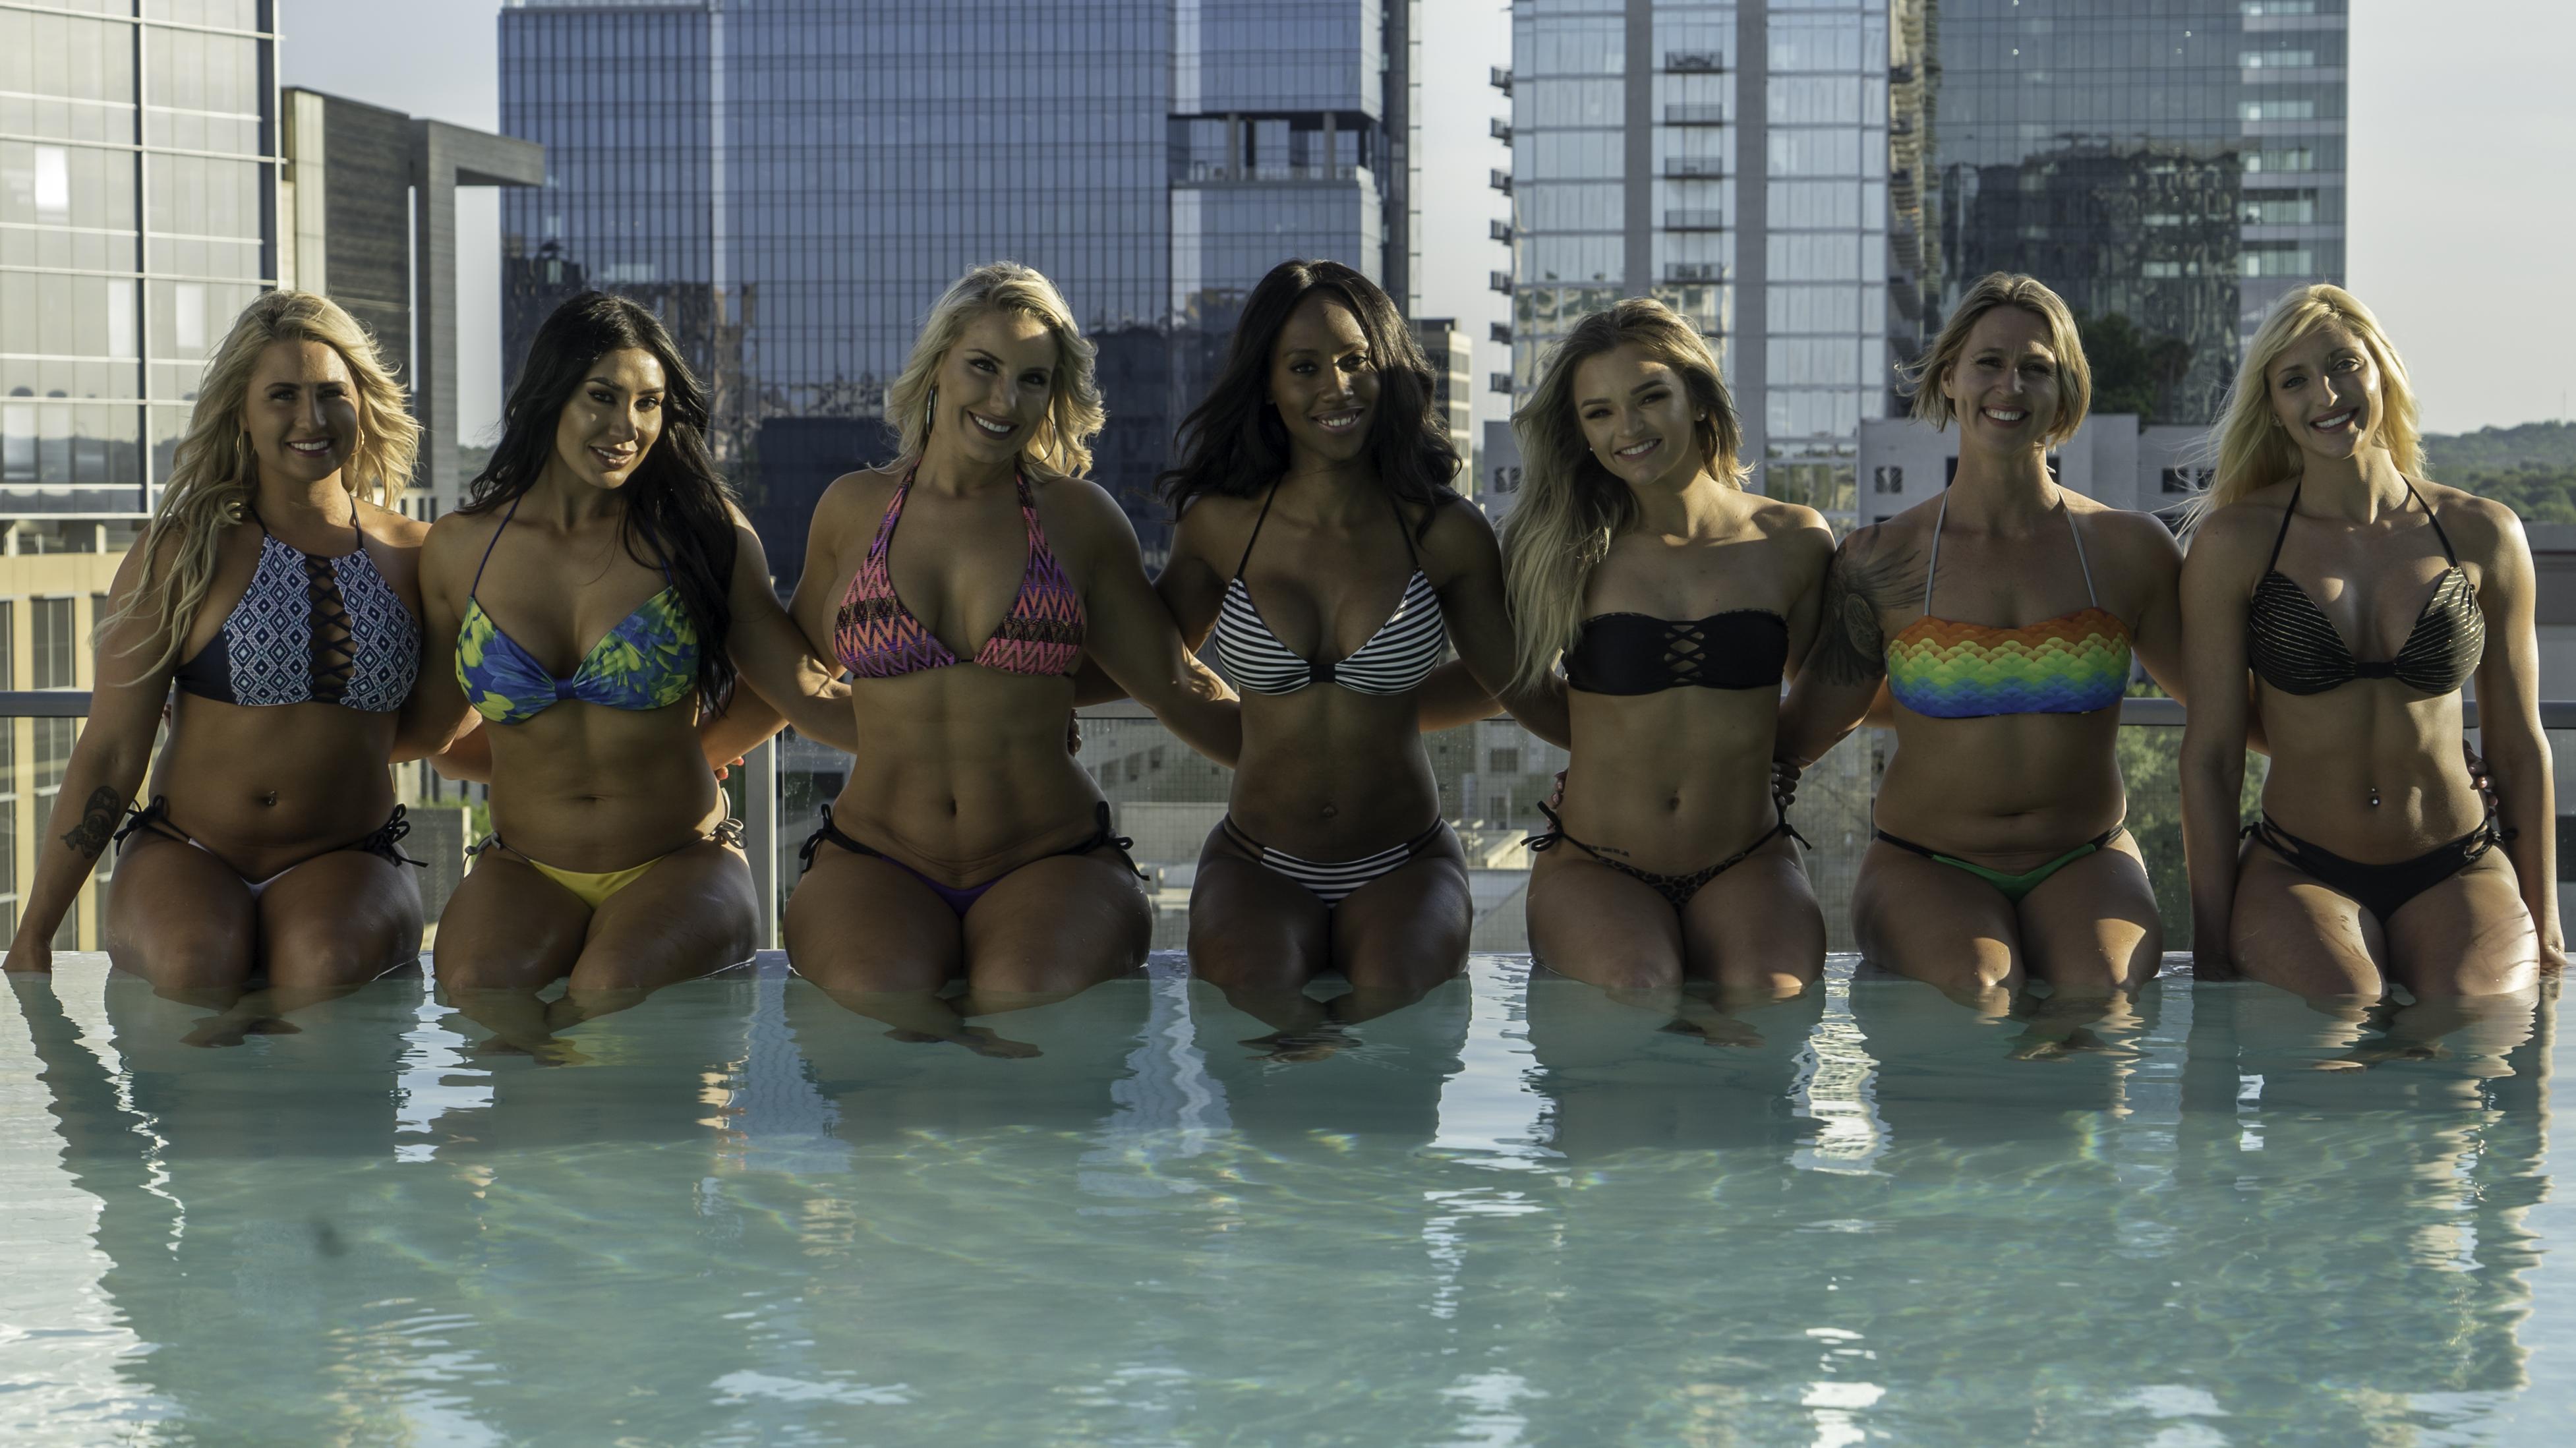 Bodacious Bikini Babes